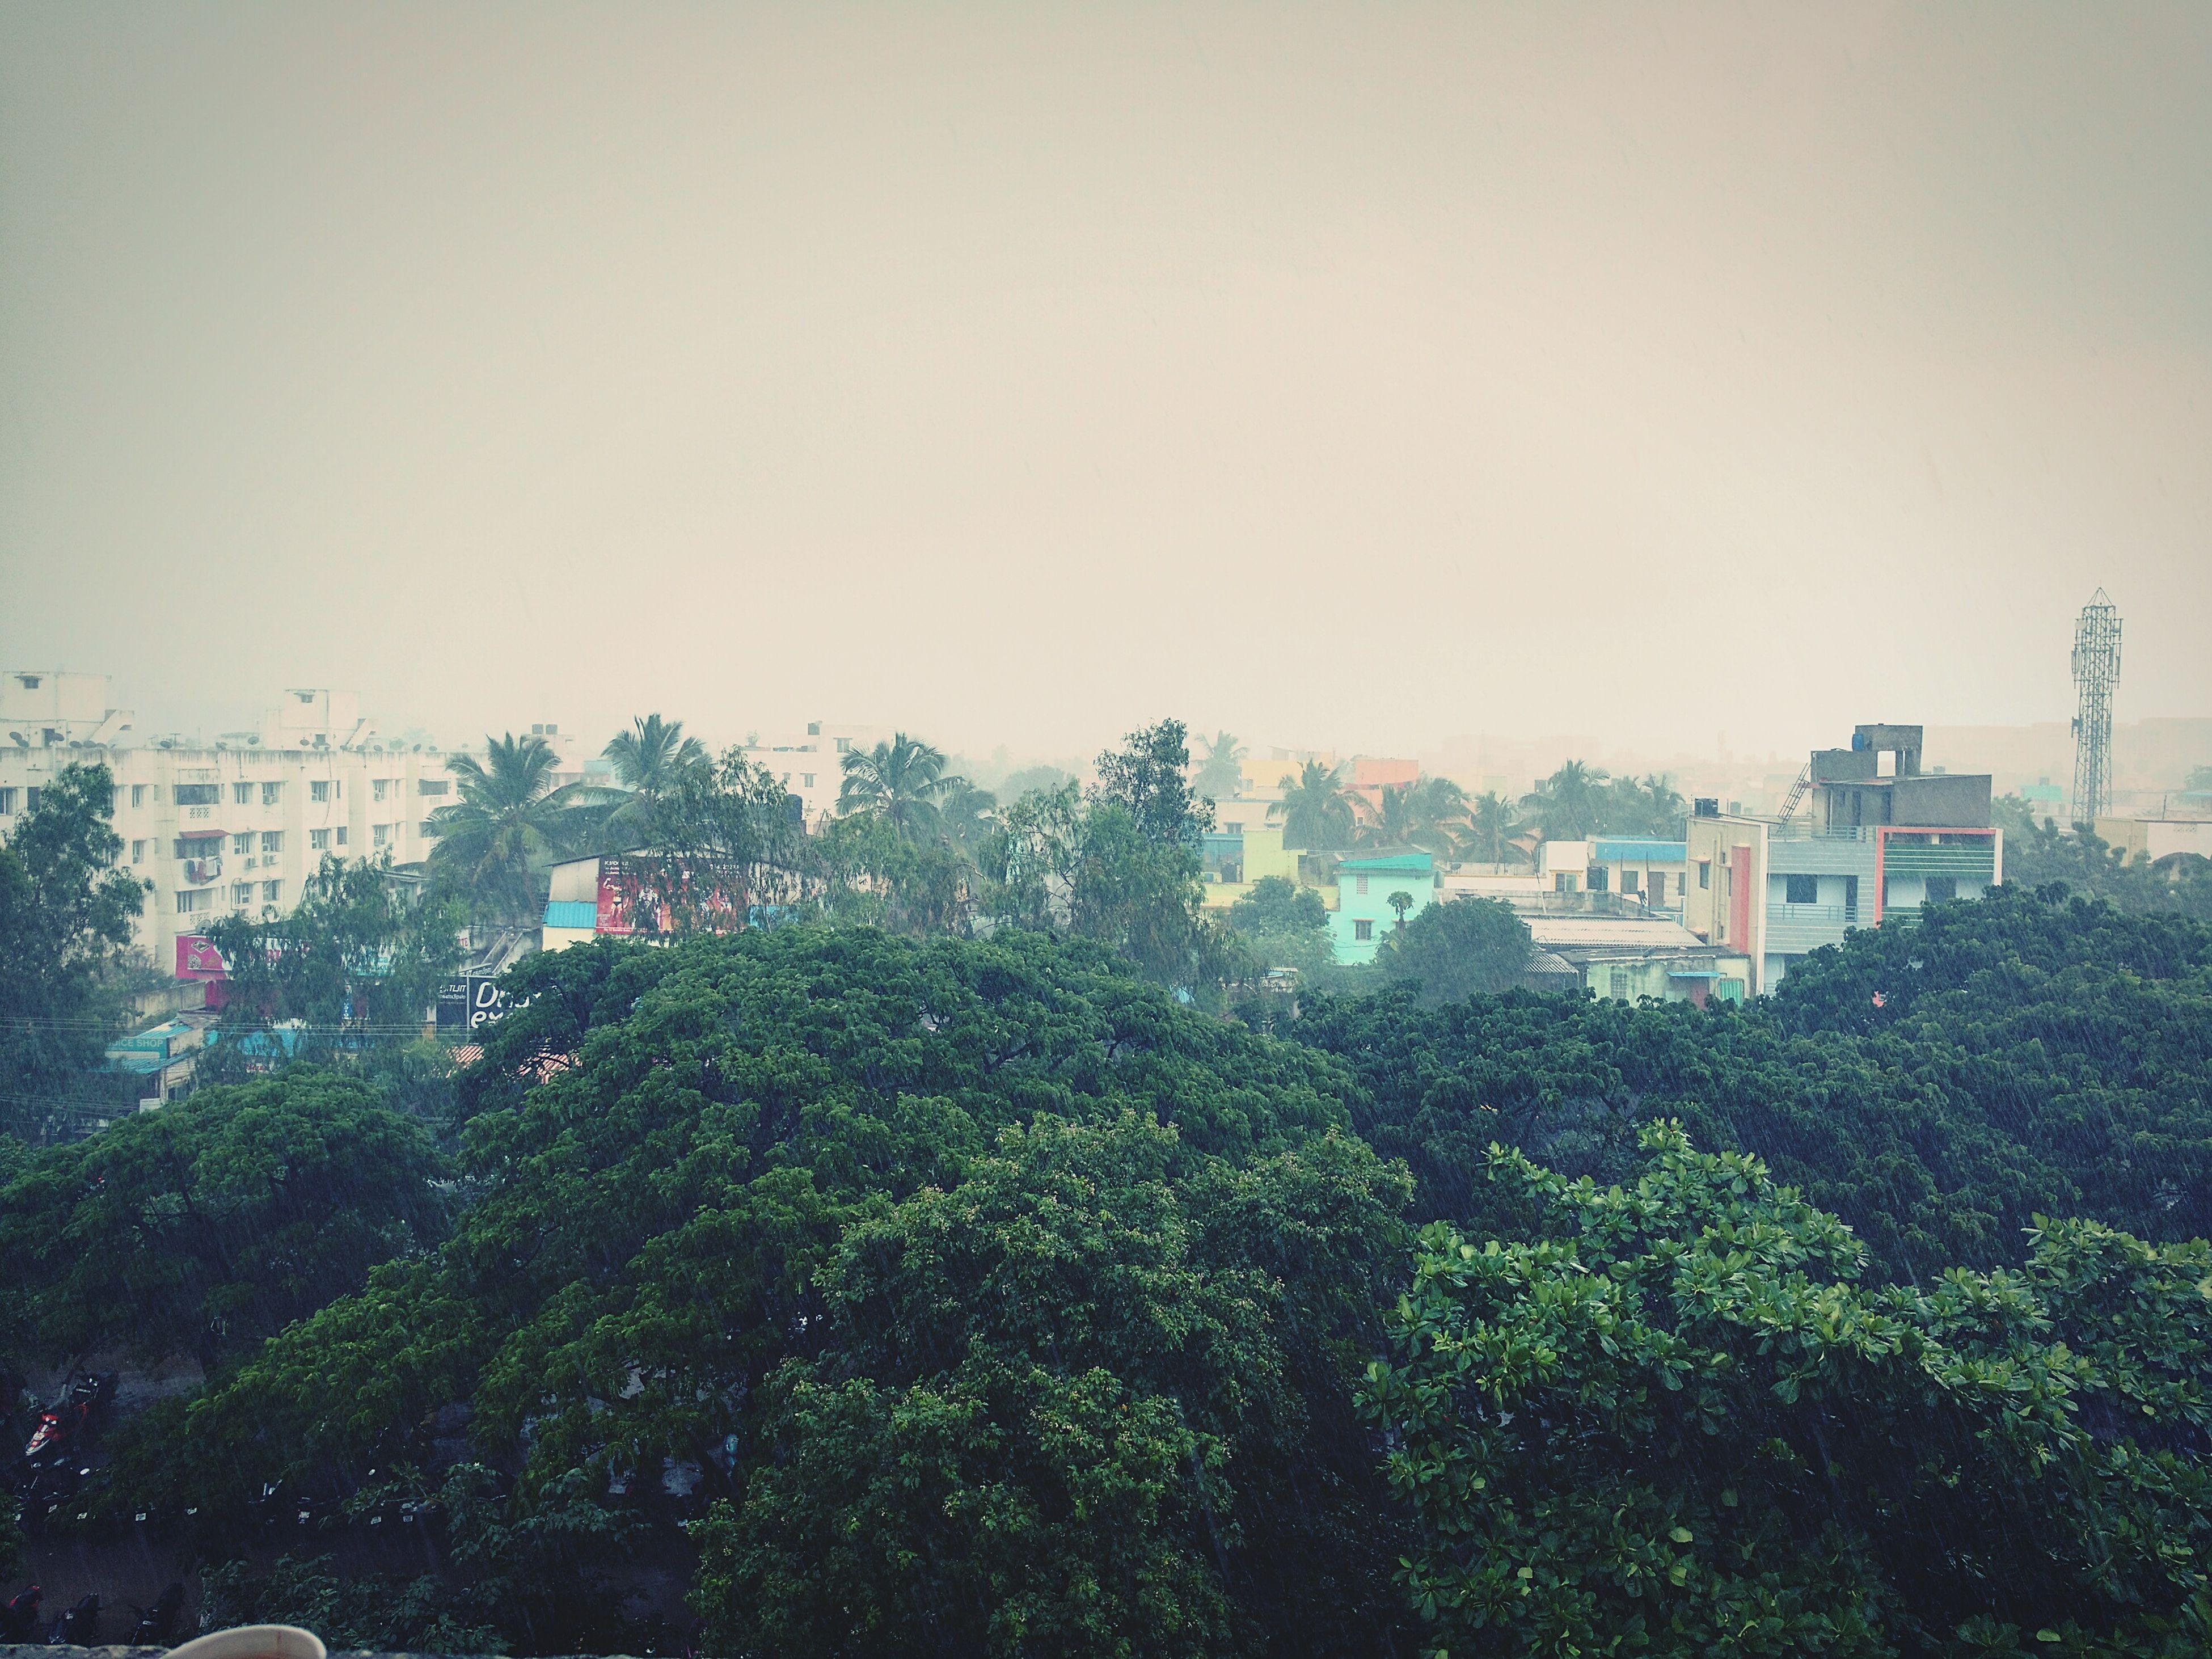 Rainy season begins... Classhours Windowside View First Eyeem Photo